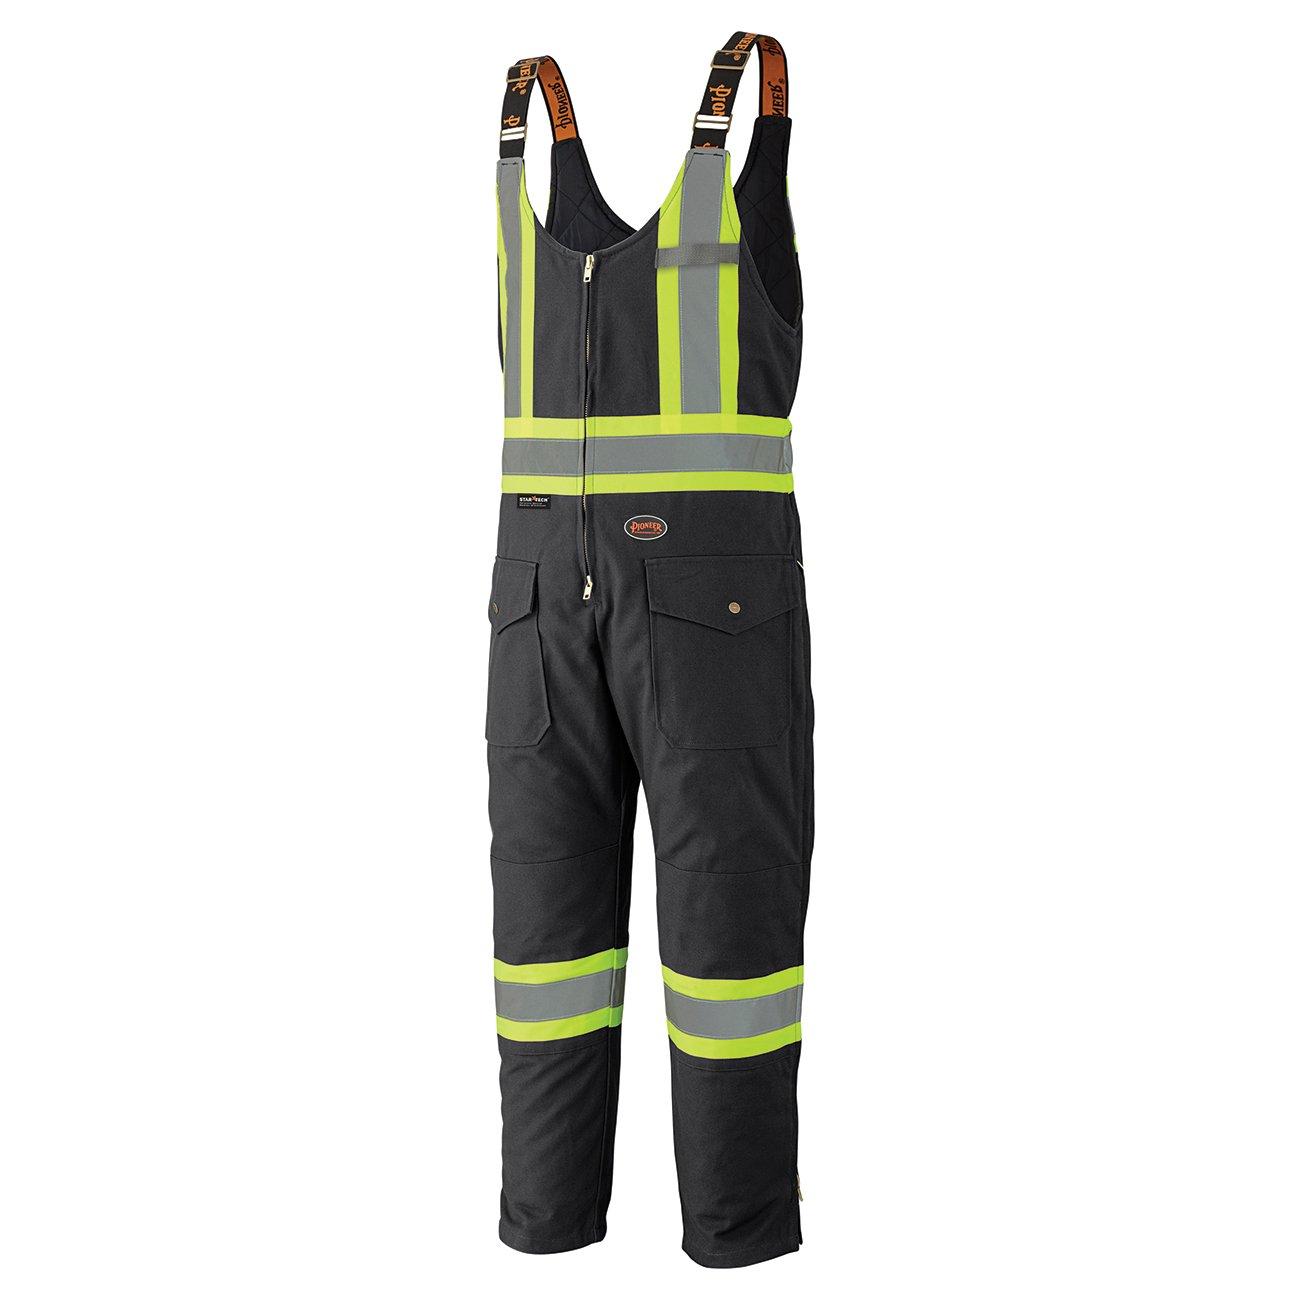 Pioneer V2060570-XL Insulated Heavy-Duty Work Overall, 4 Pockets, Men Hi-Vis Bib Pants, Black, XL